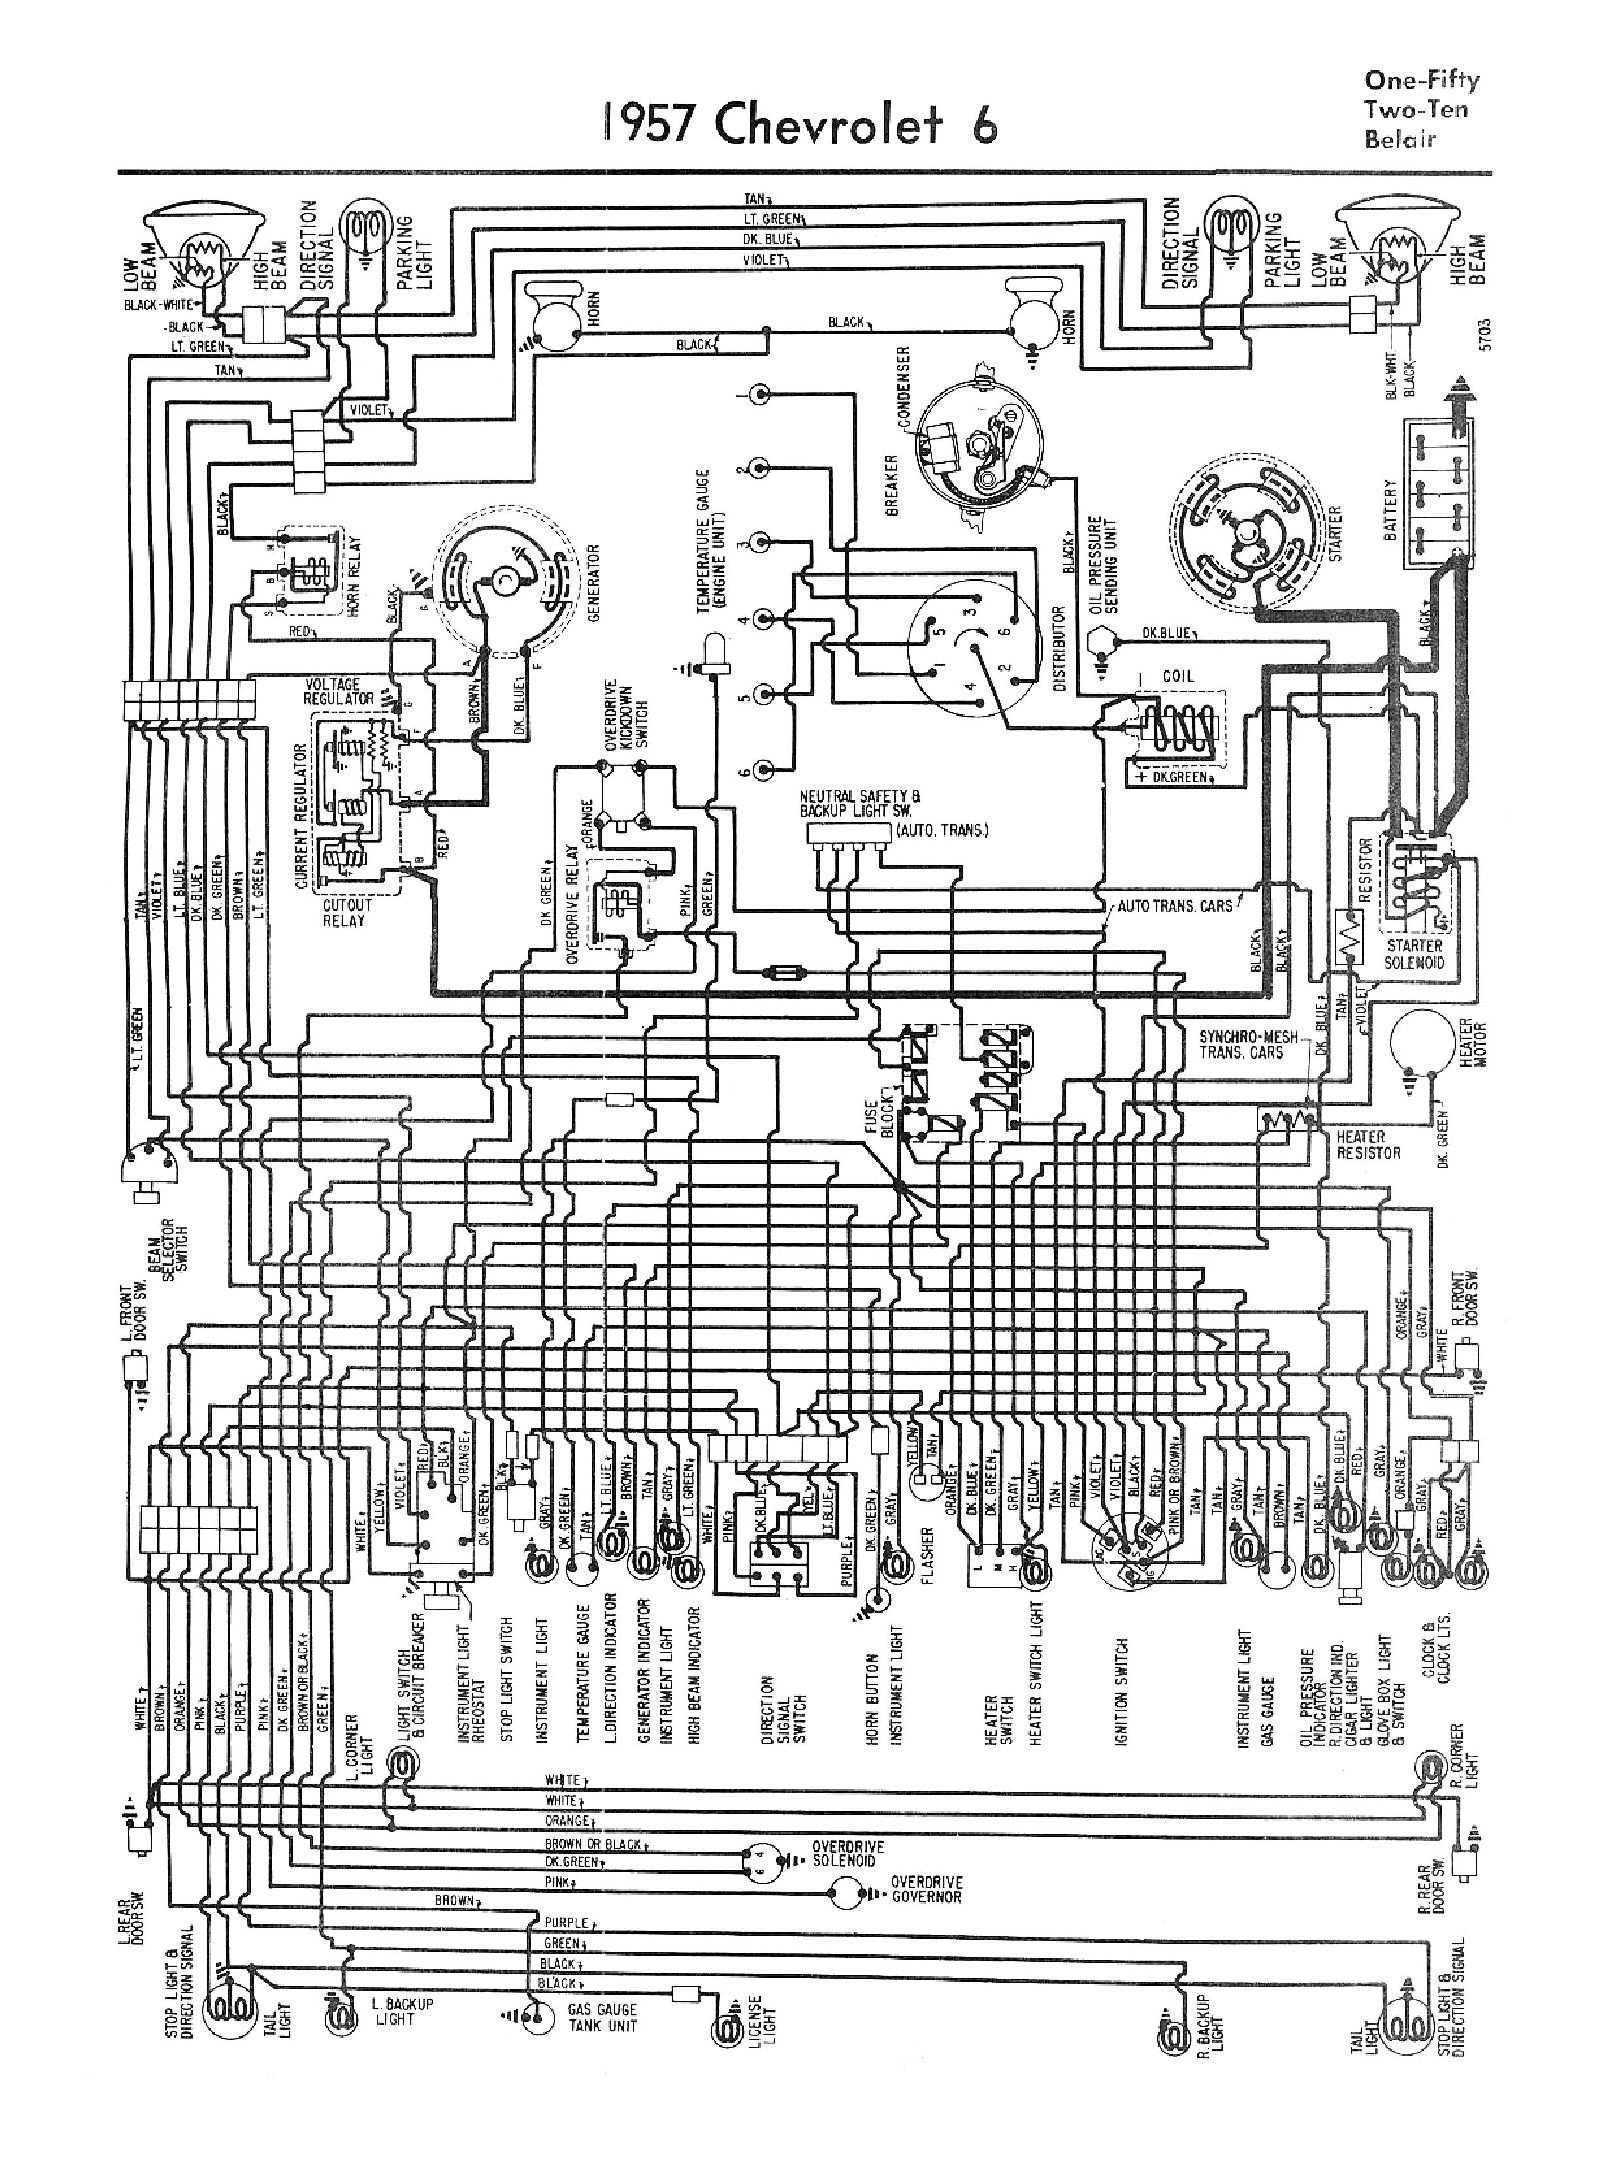 1966 corvette starter wiring diagram wabco air suspension 1959 dash diagrams free engine image for